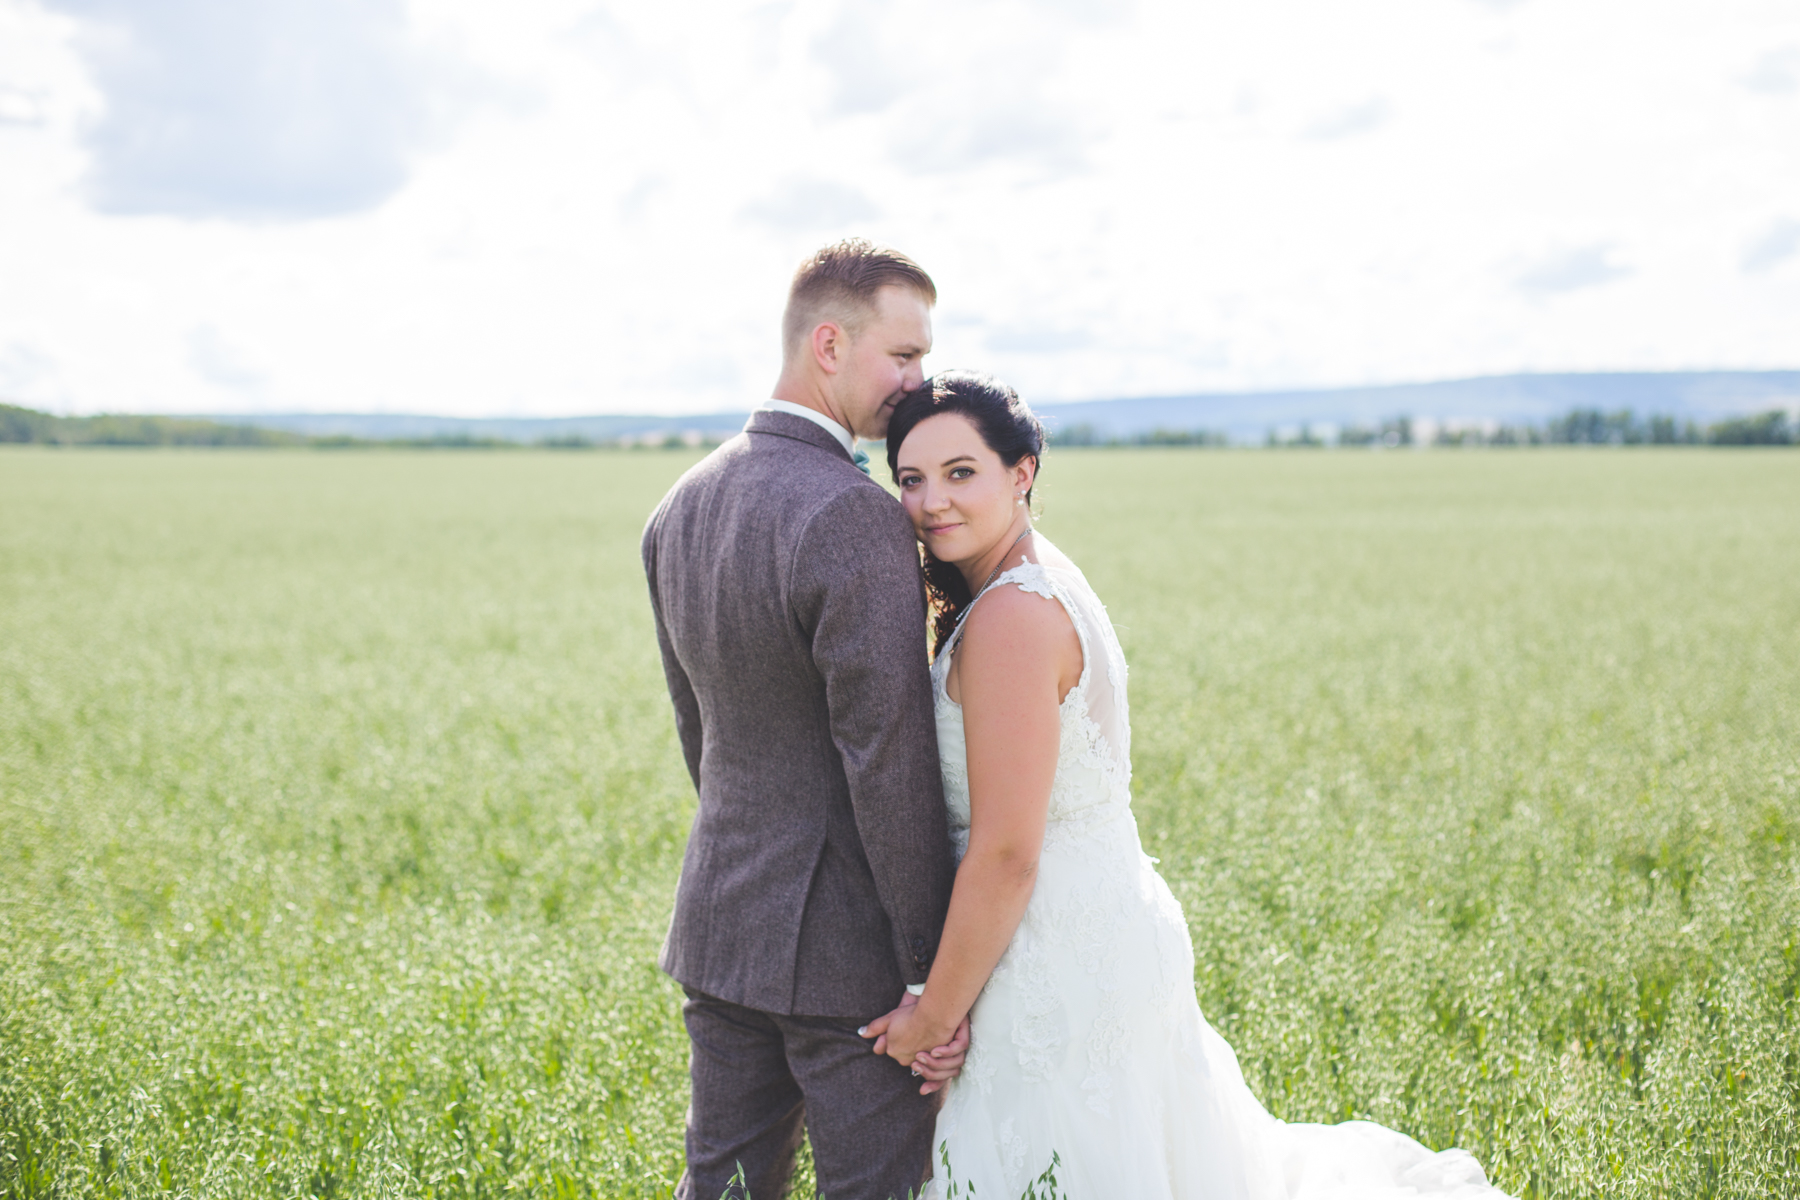 20150808-oglovewedding-919.jpg